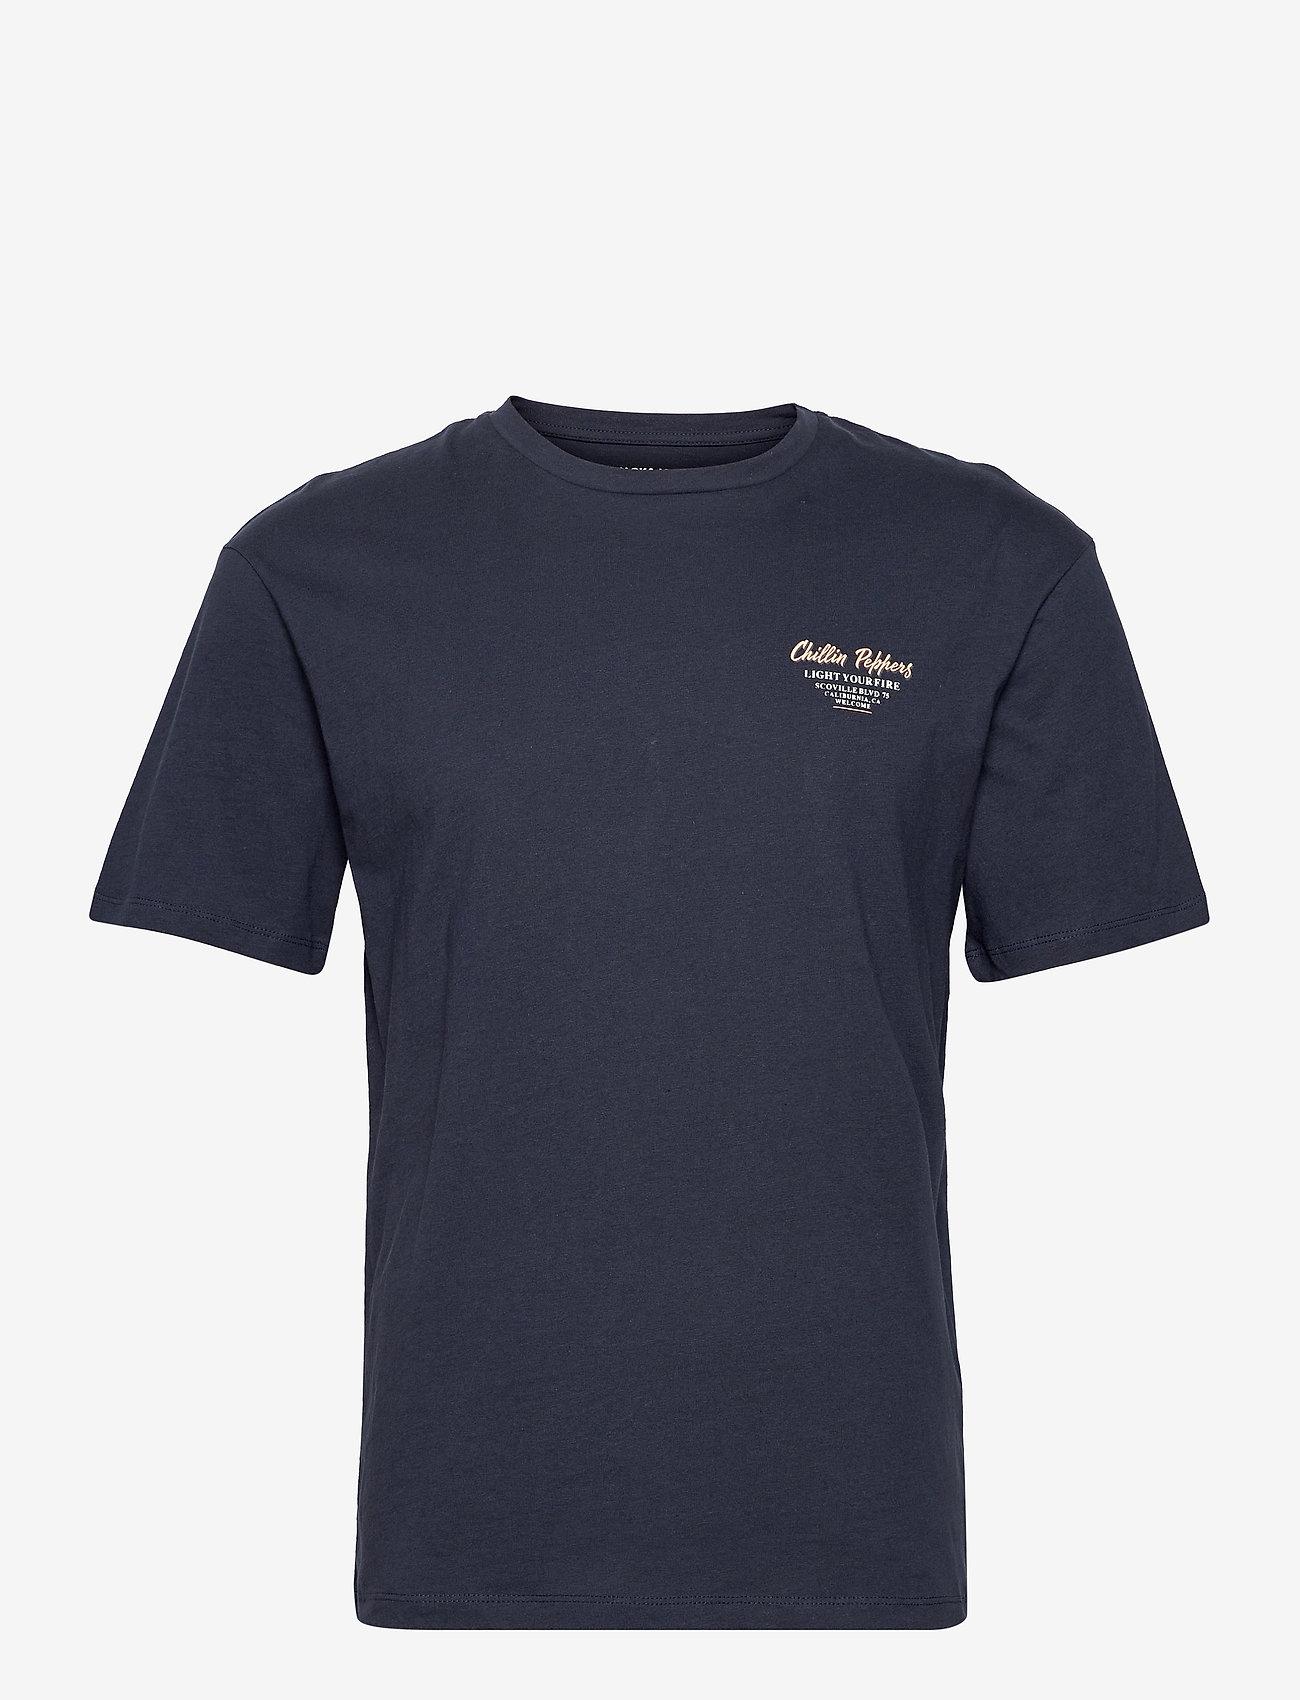 Jack & Jones - JORHUNGRY TEE SS CREW NECK - basic t-shirts - navy blazer - 0